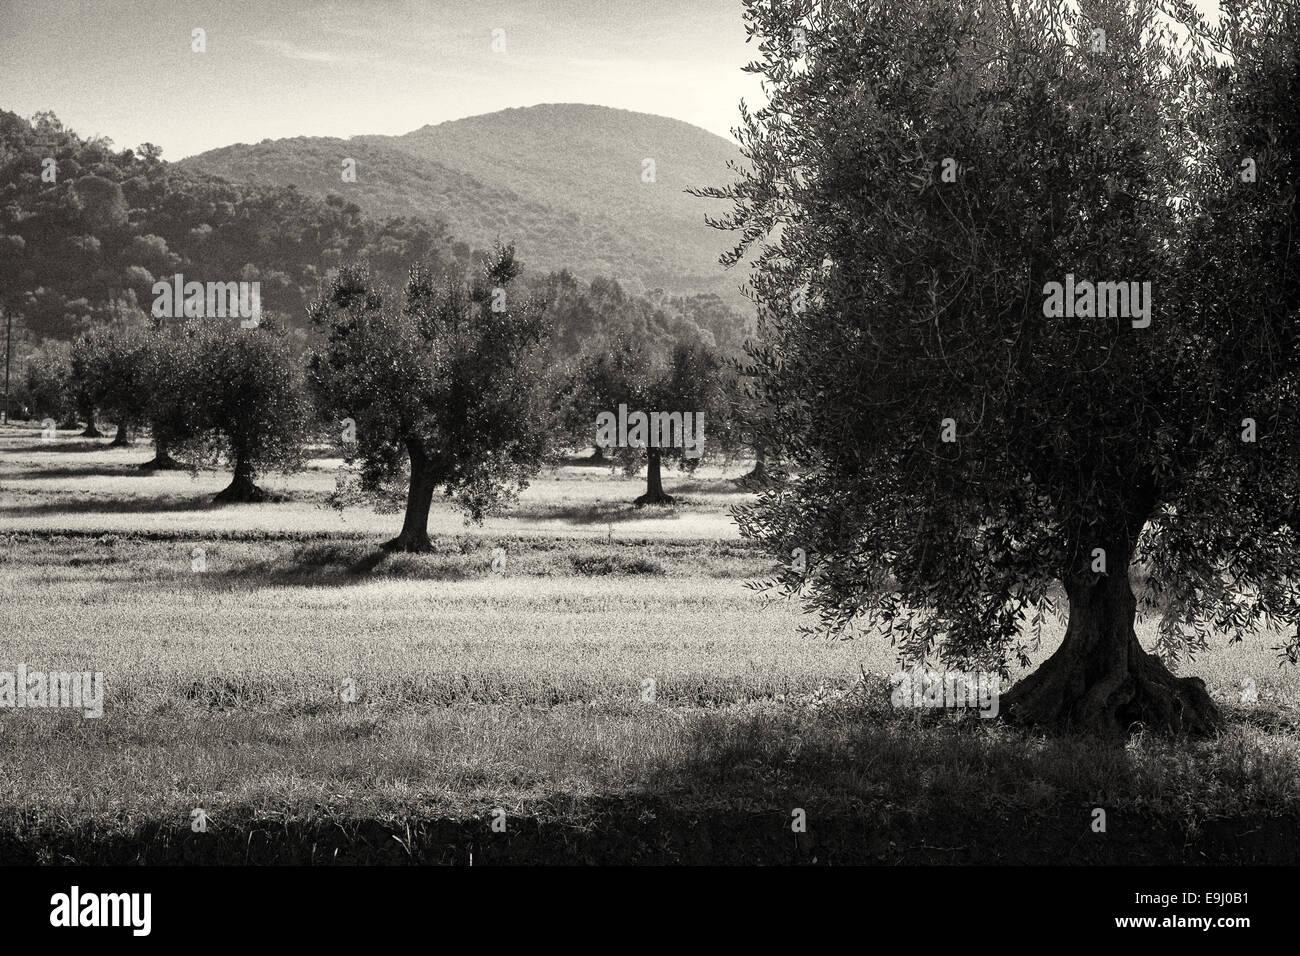 Scarlino is a comune in Grosseto Province in the Italian region Tuscany - Stock Image